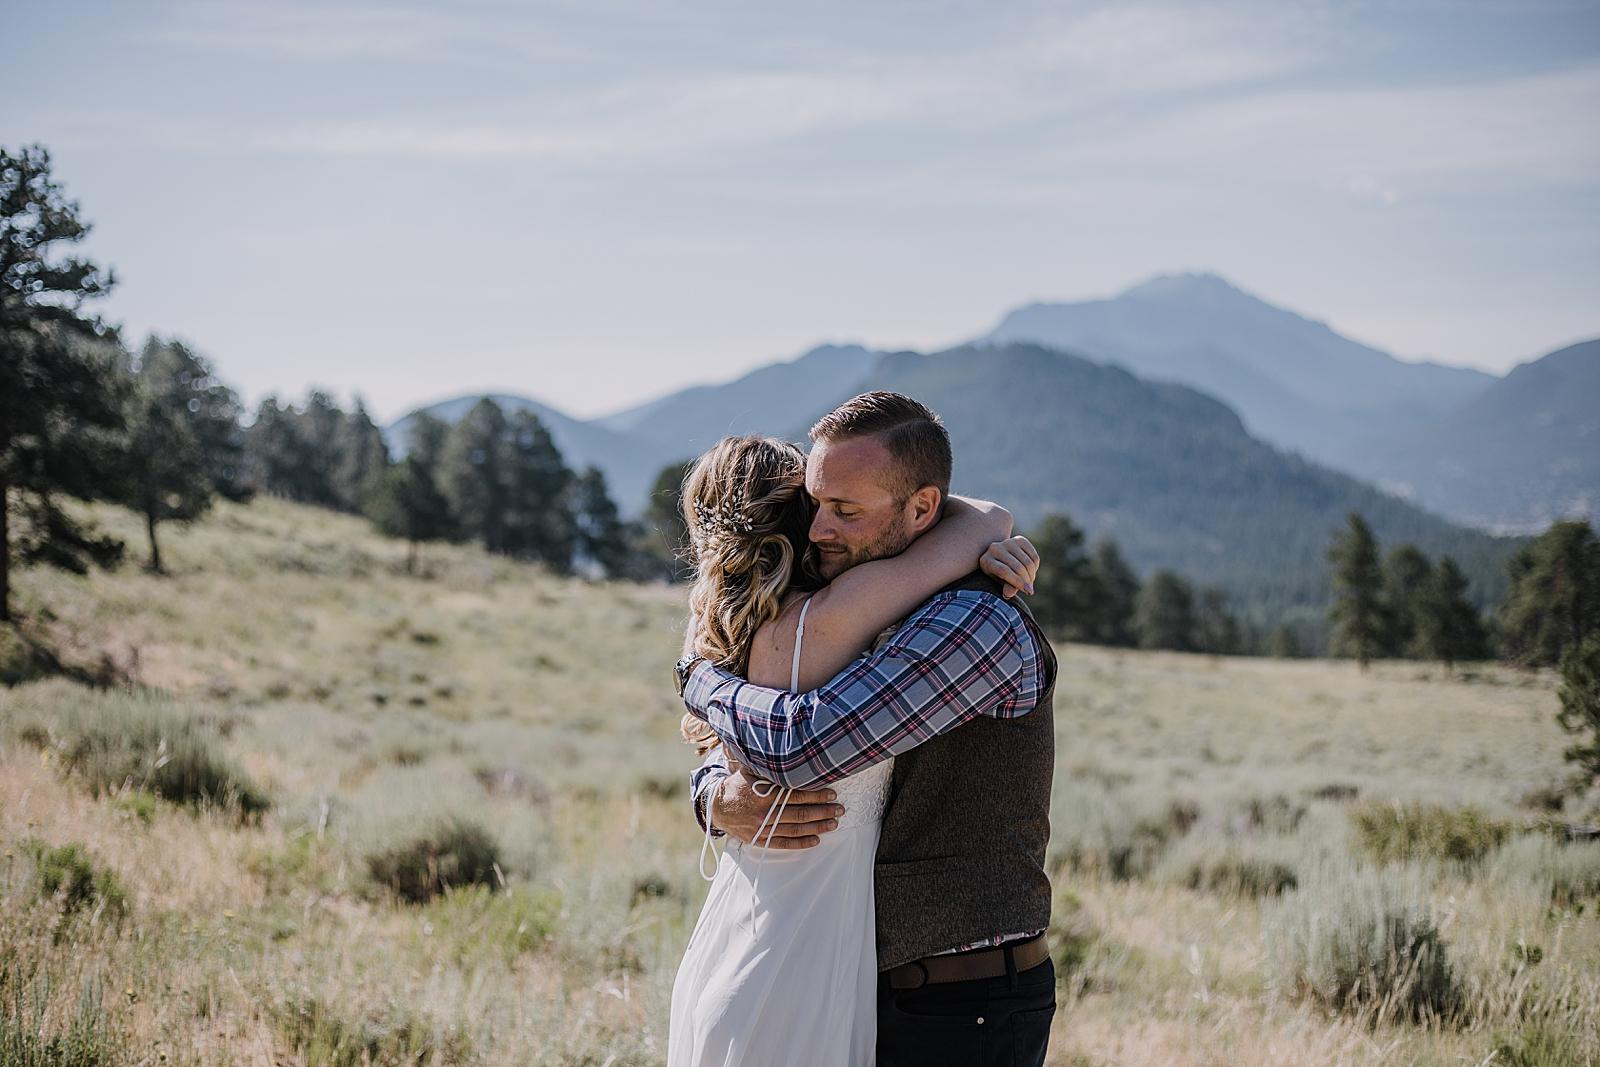 elopement couple first look, rocky mountain national park elopement, 3M curves elopement, self solemnizing, self solemnization, long's peak ceremony, hiking elopement, estes park elopement